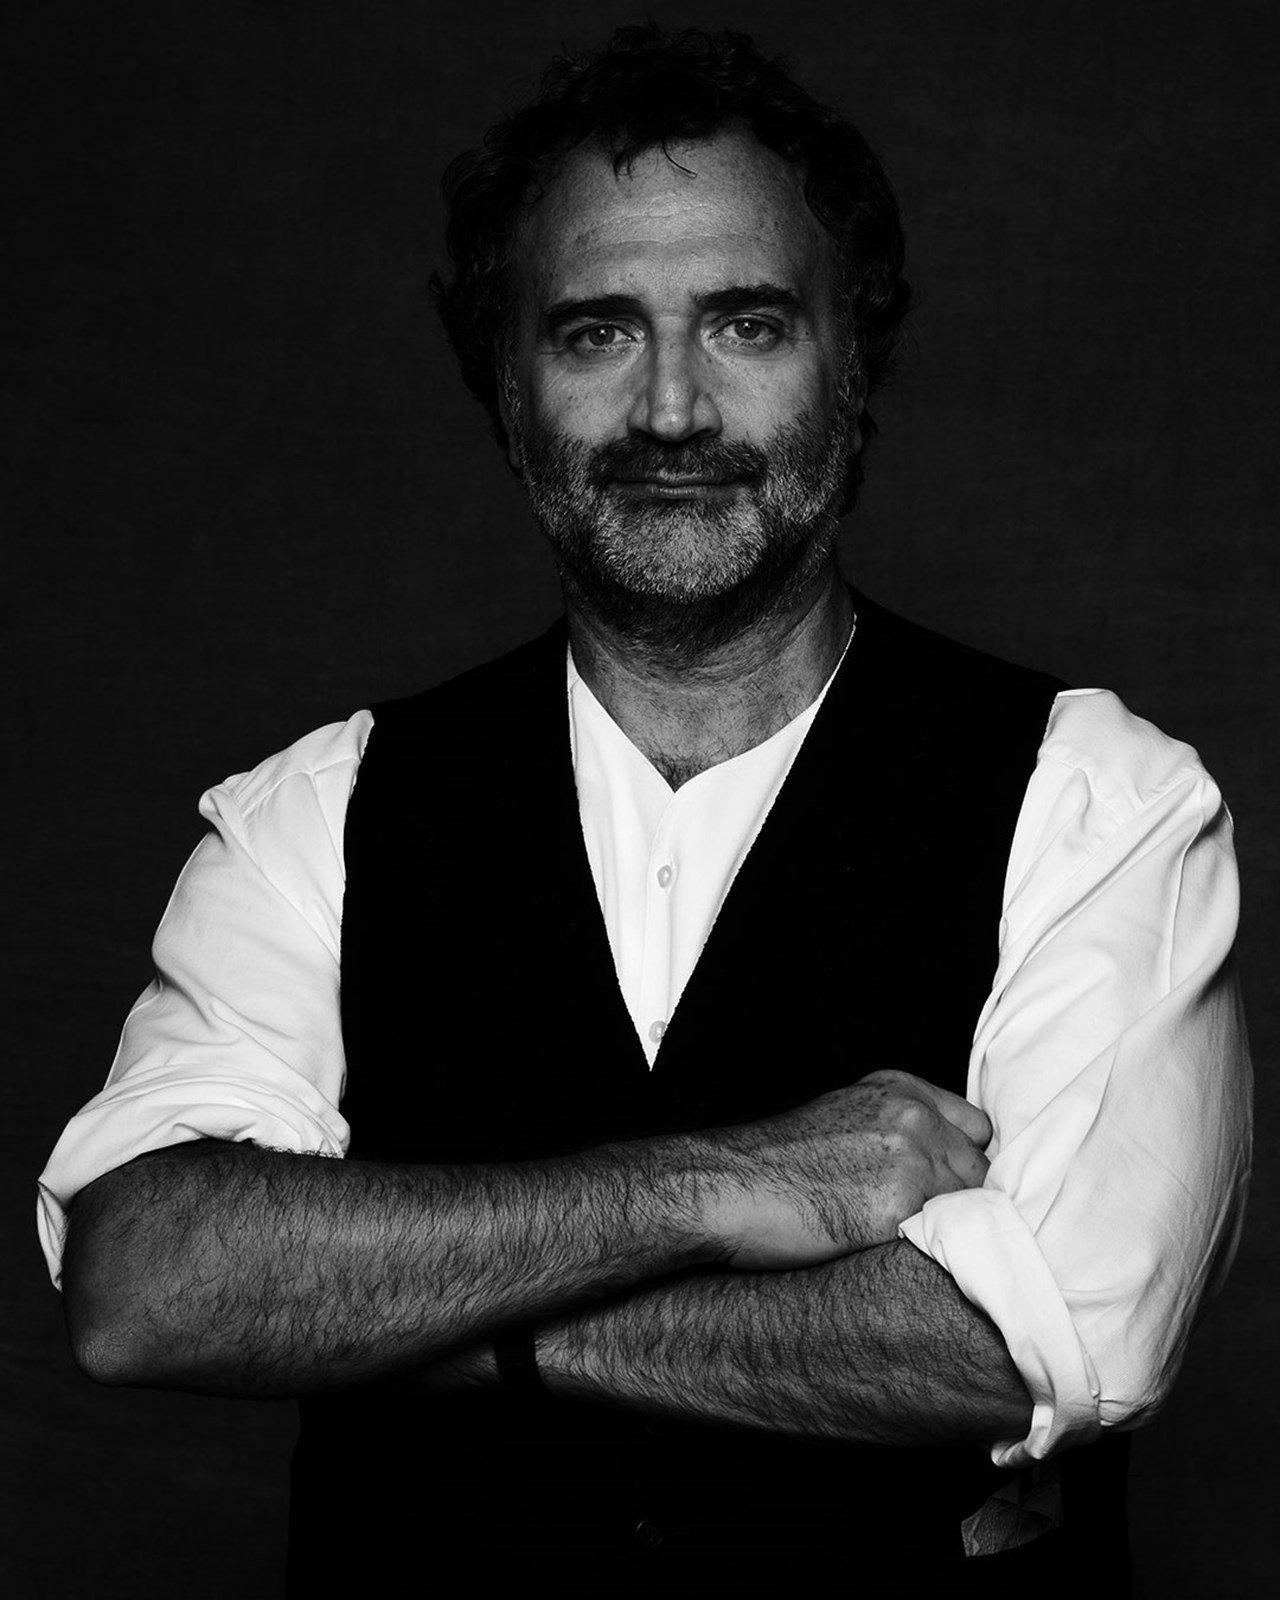 1983 - Fabrizio Ferri Founds industria SuperStudio in Milan